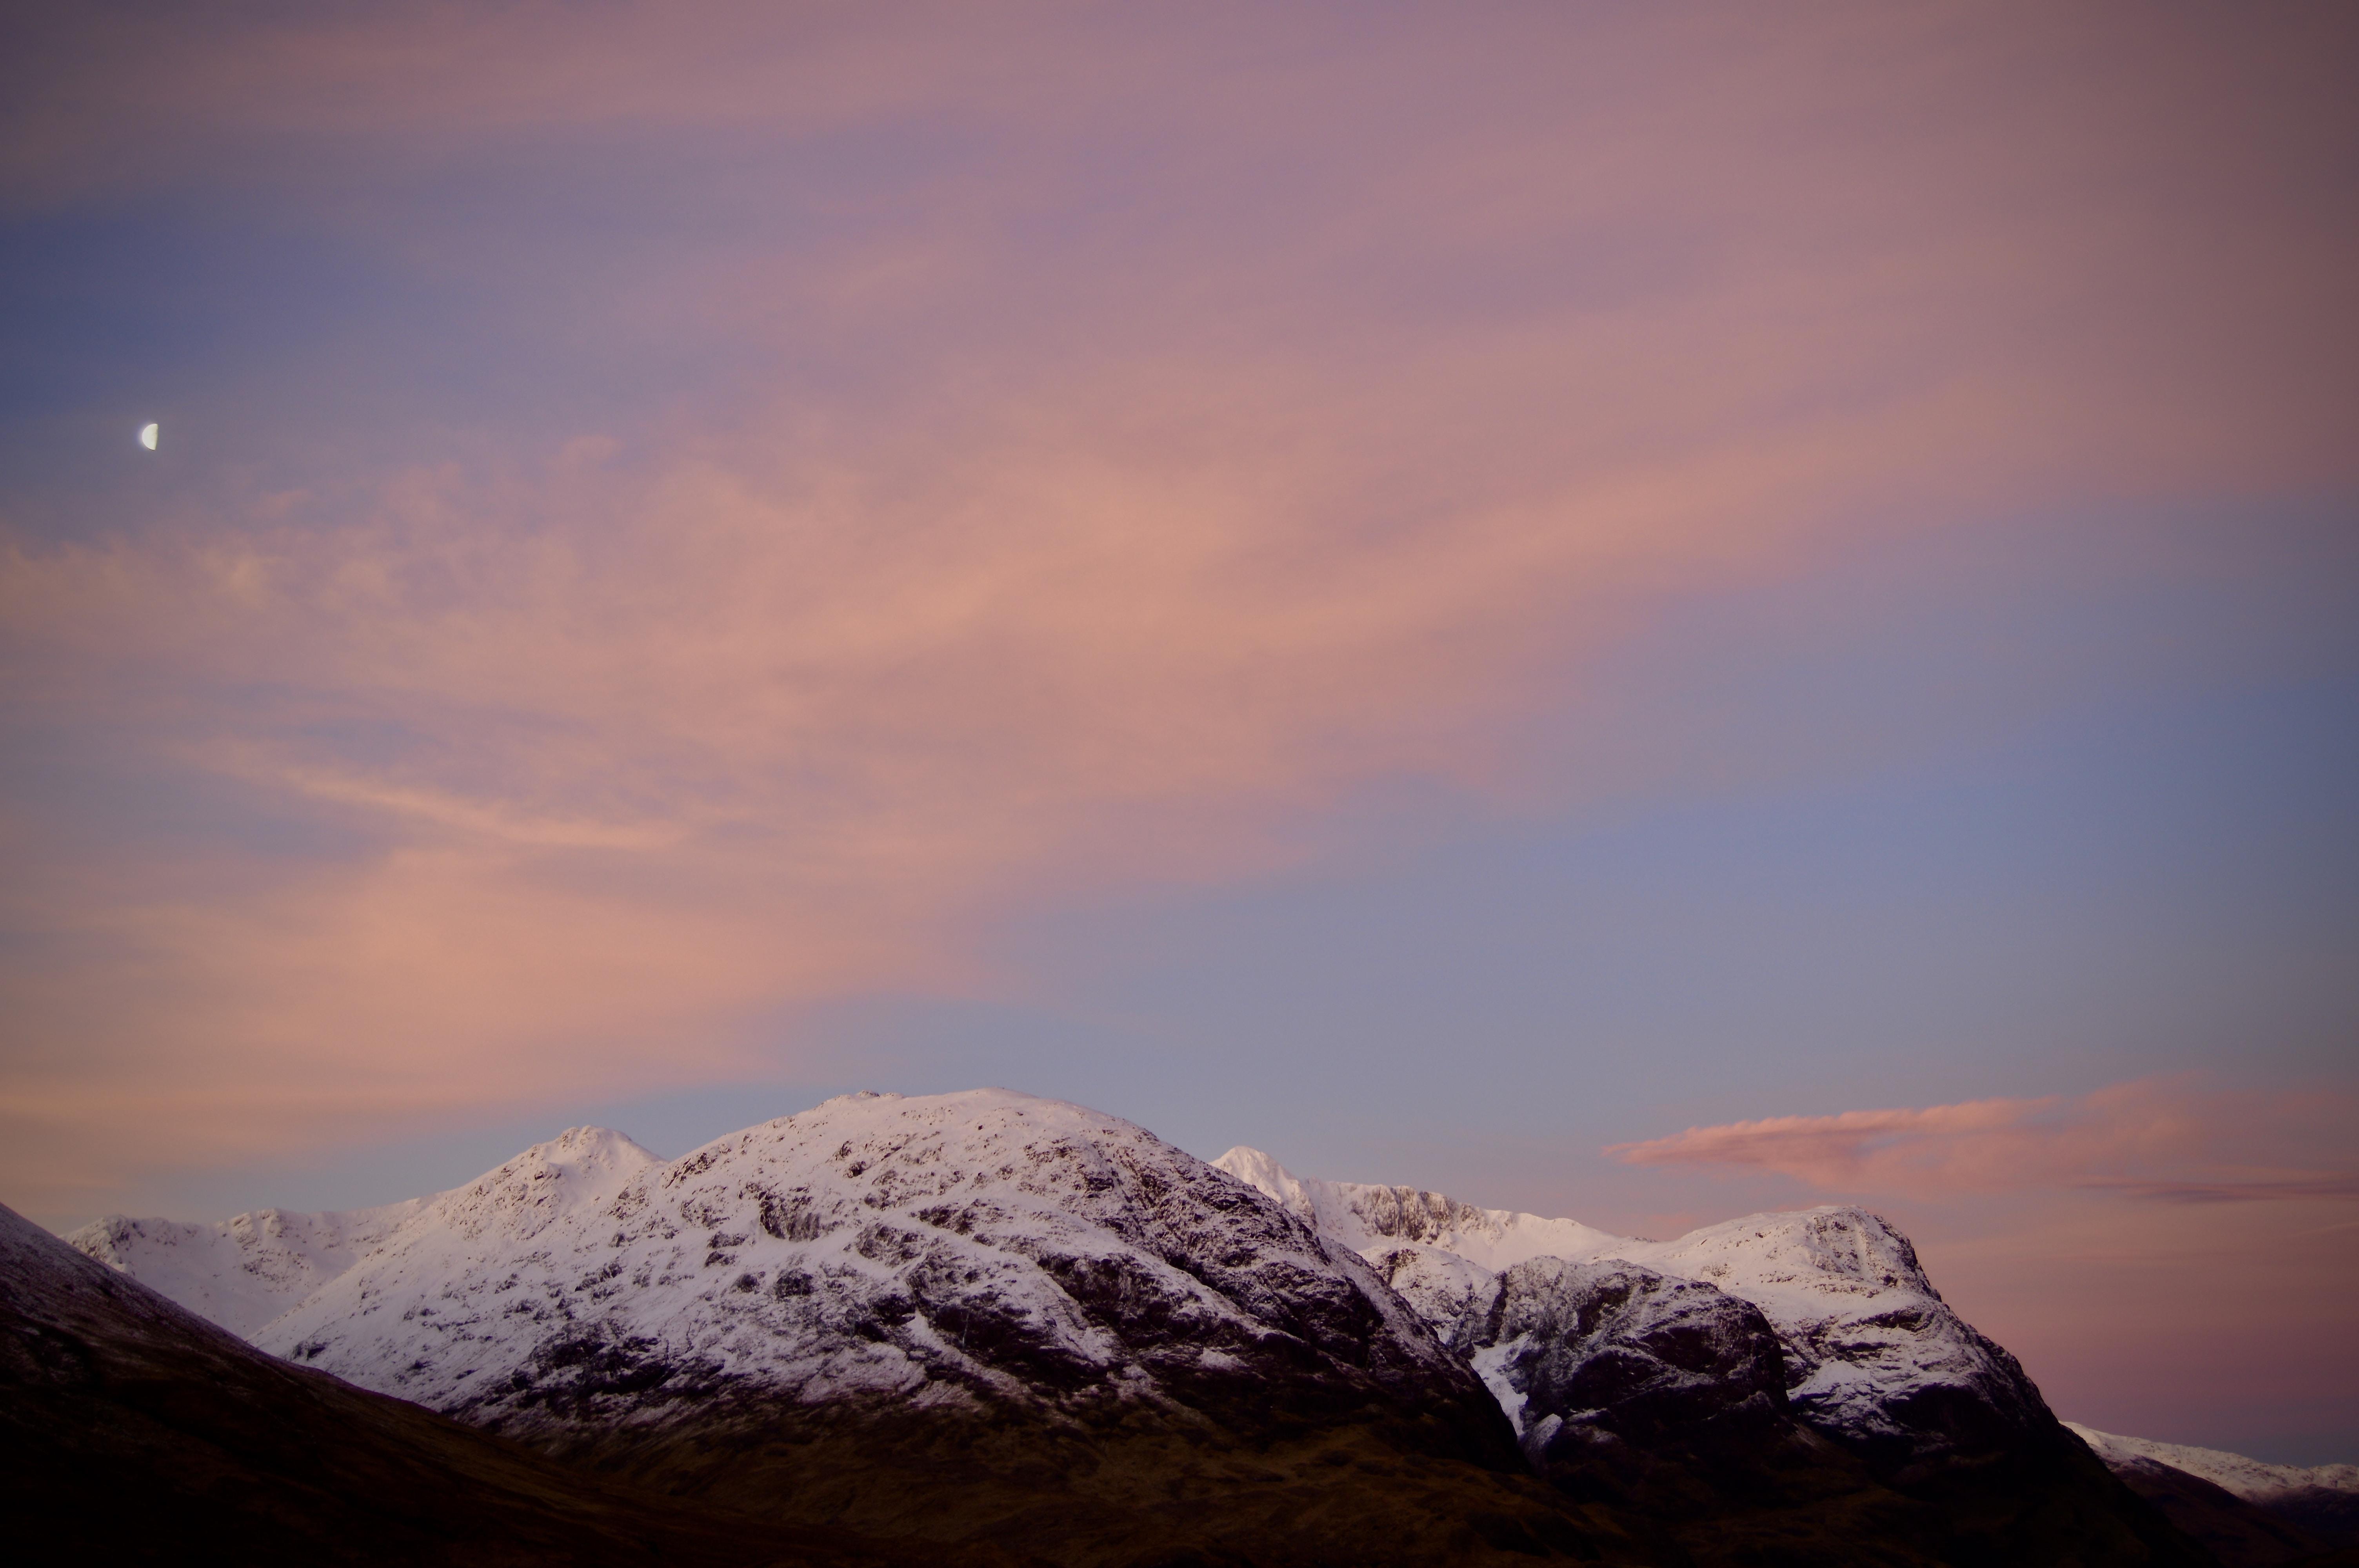 snowy mountain under gray sky